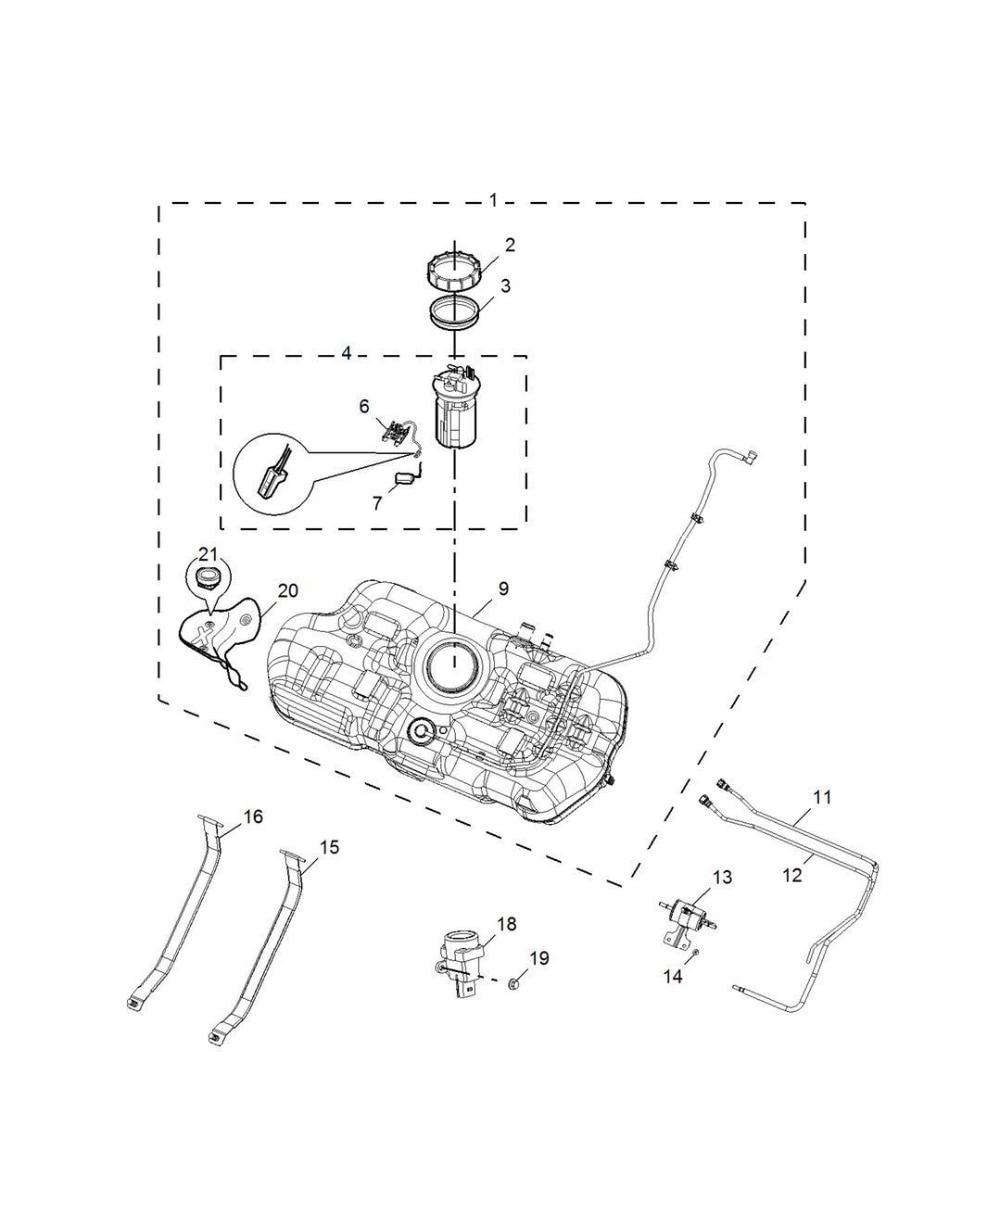 New Fuel Pump For 1999 2000 2001 2002 Land Rover Freelander 1.8L 2.5L WFX000130